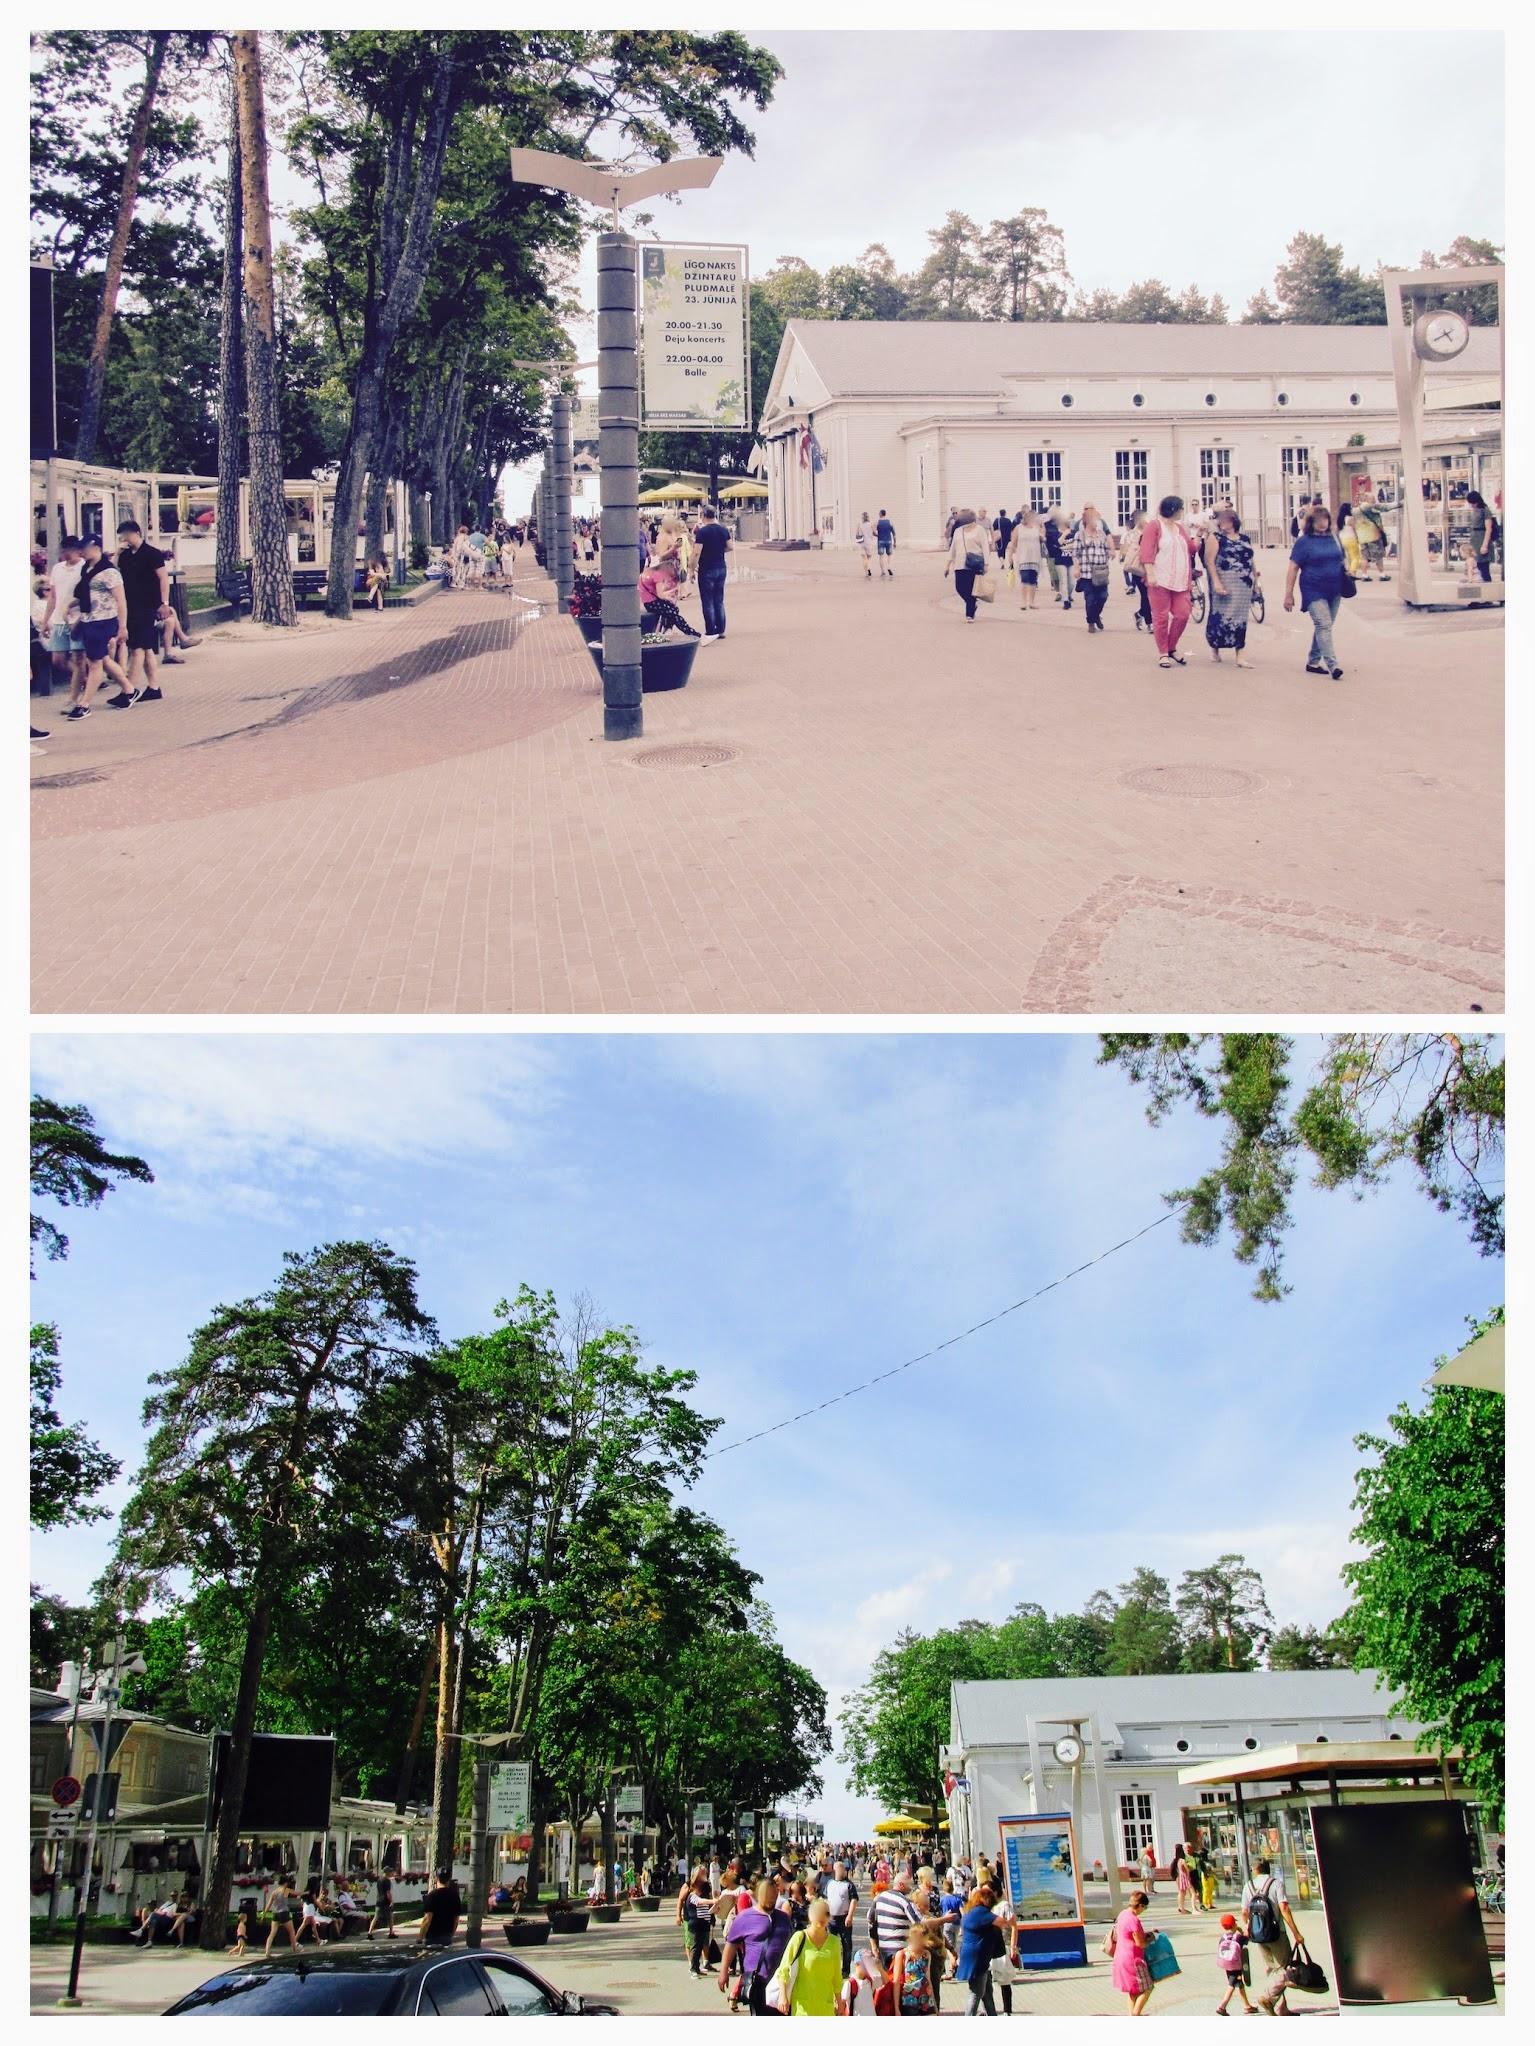 Area around Dzintari Concert Hall usually is full of people - Urban Treetops